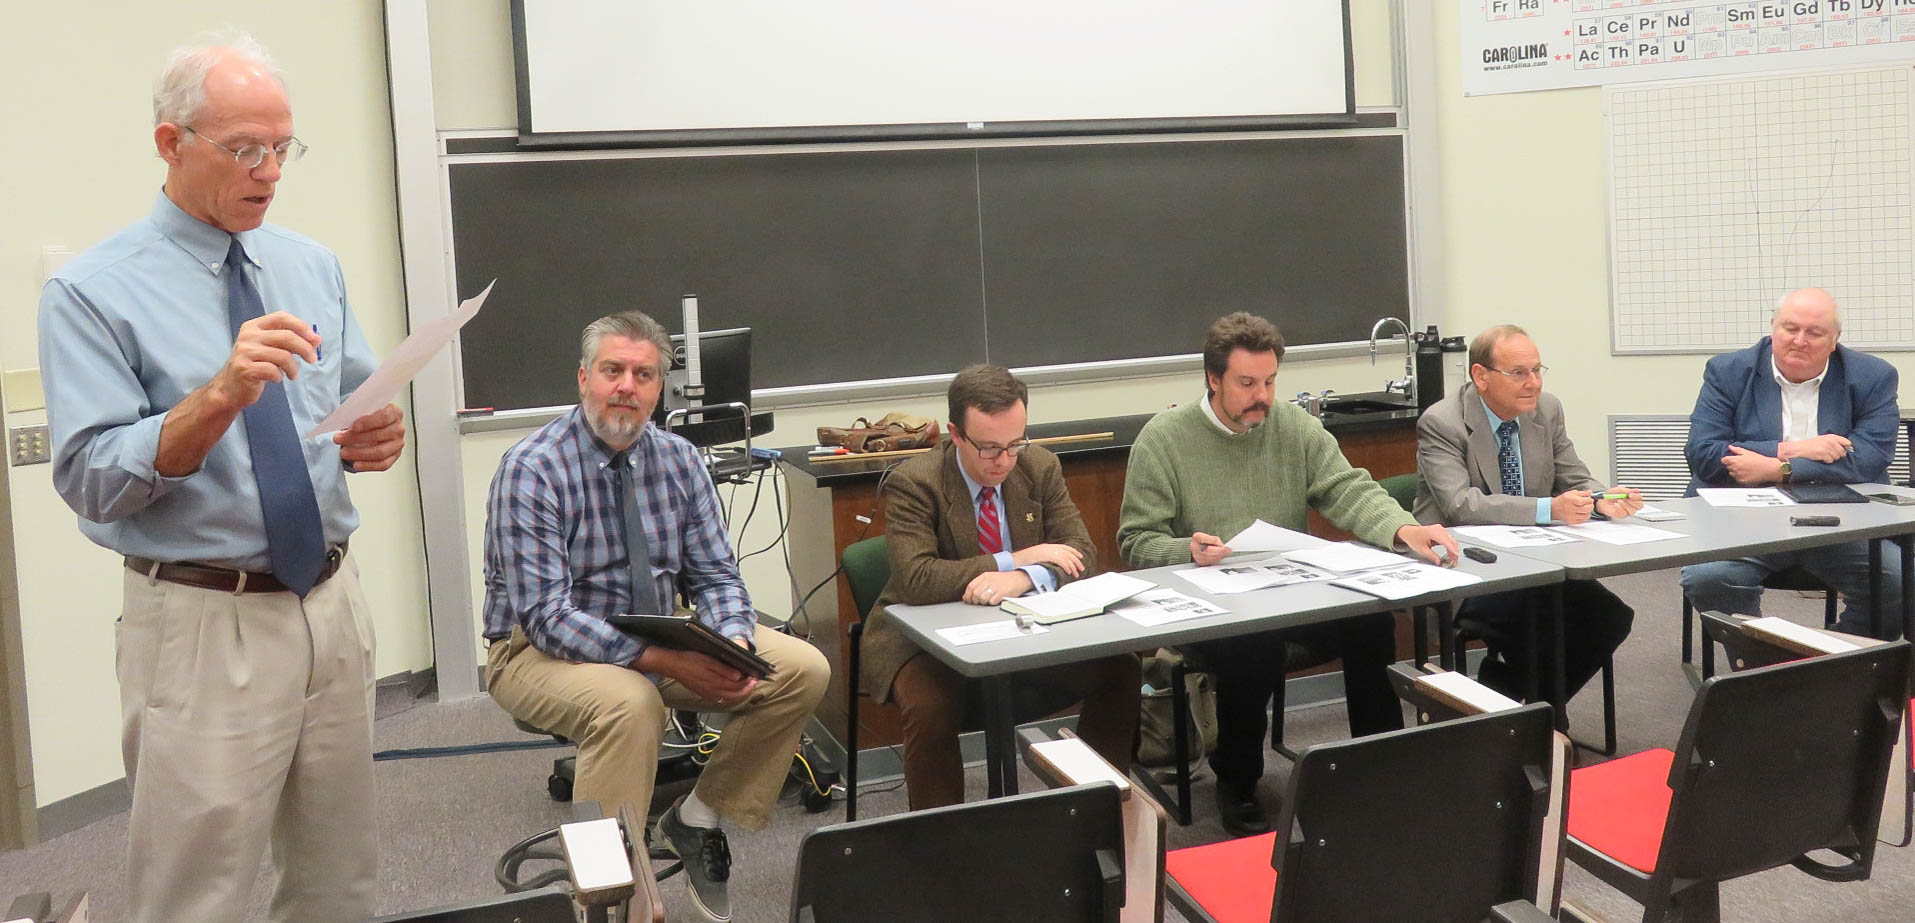 New Symposium Society: Language Matters